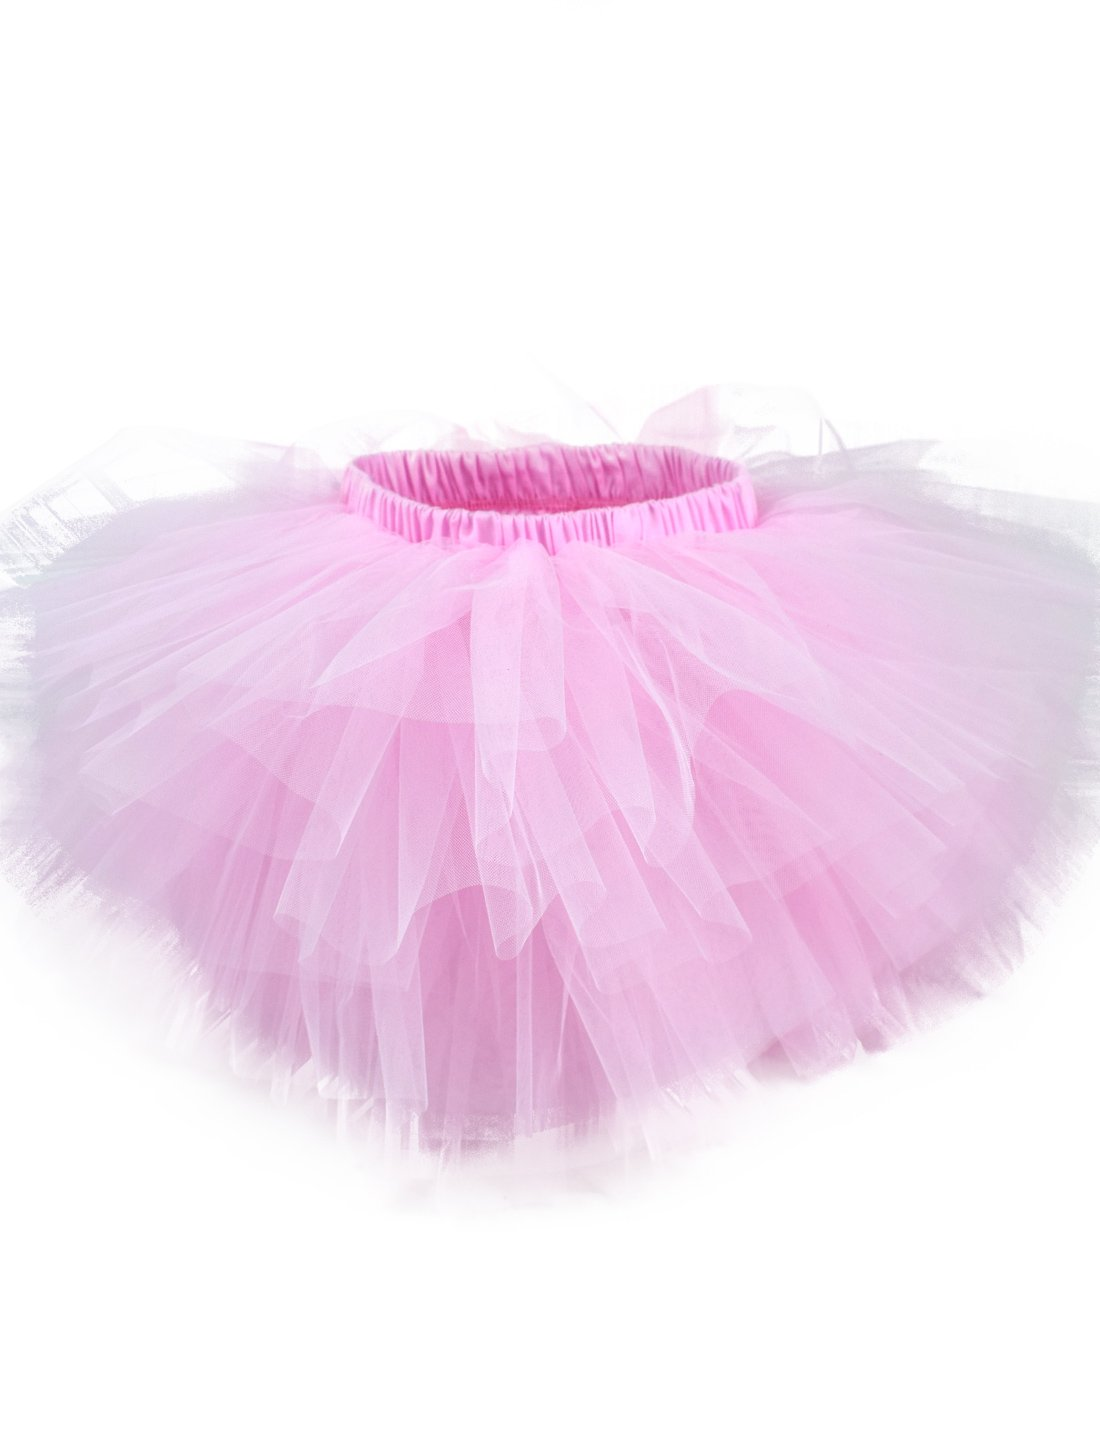 tortoiserabbit Girl's 6-Layered Ballet Tutu Fluffy Tulle Little Princess Dancing Petticoat Ballerina Skirt Pink L